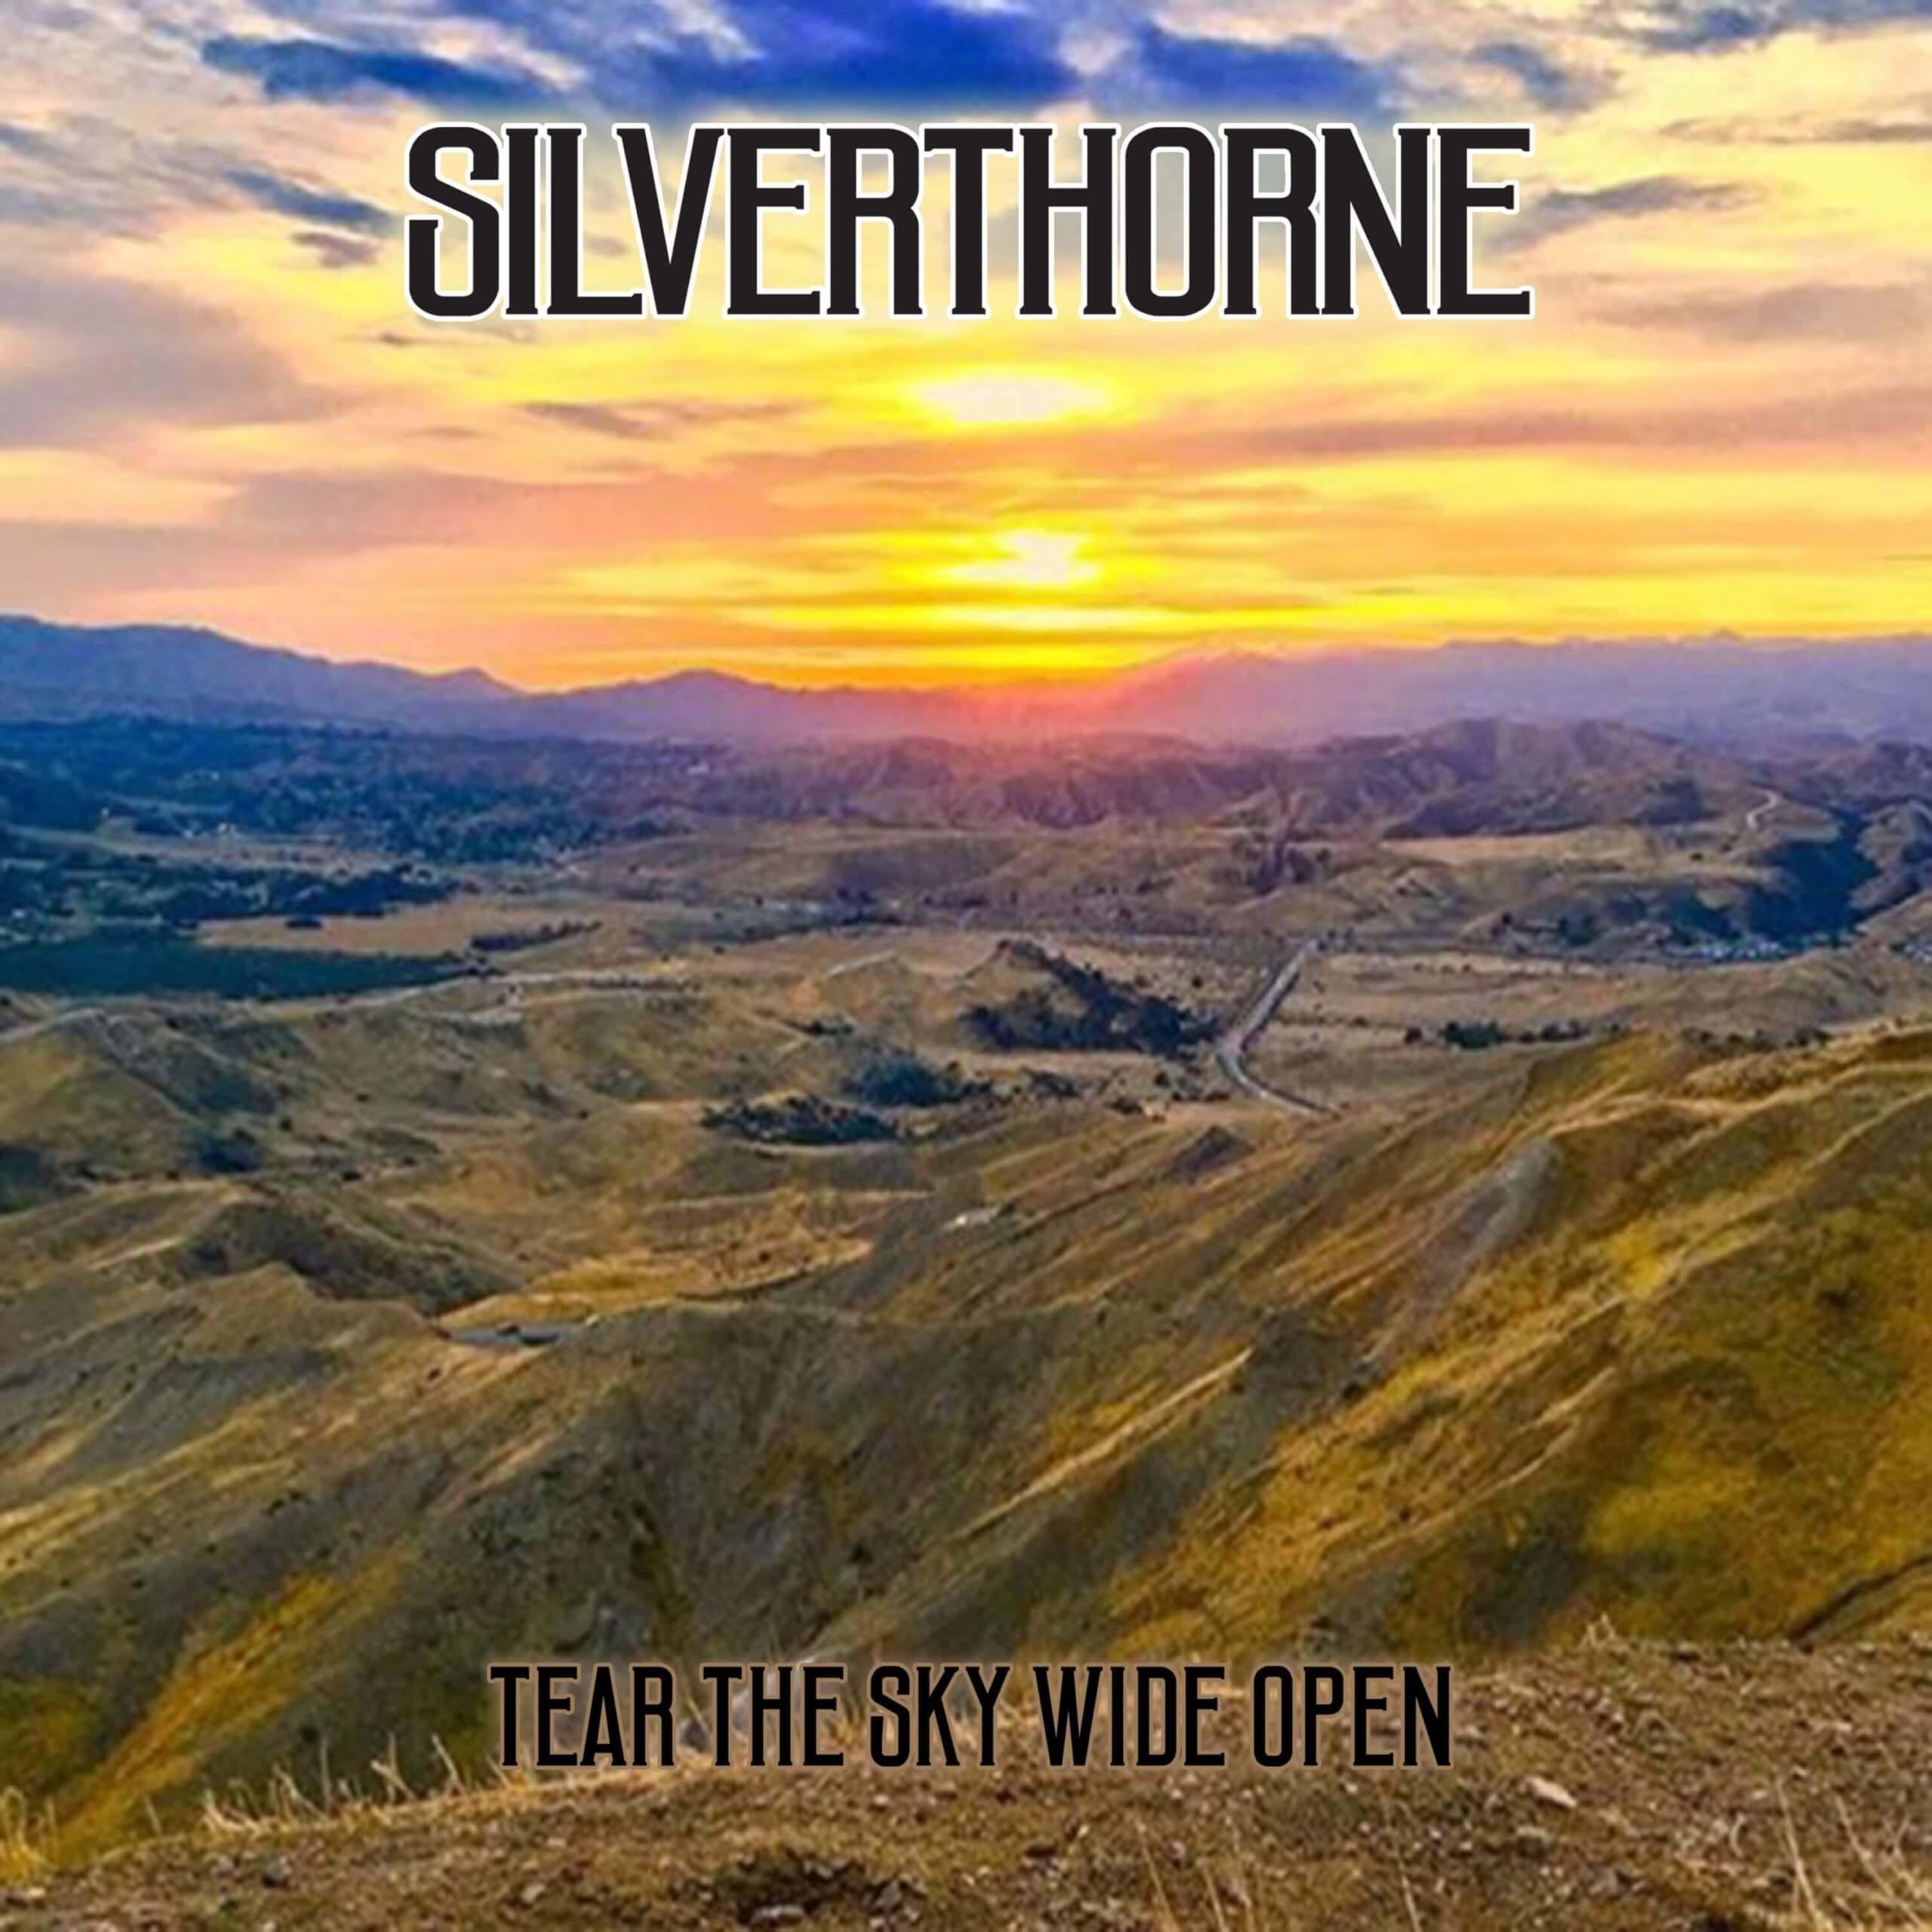 Silverthorne